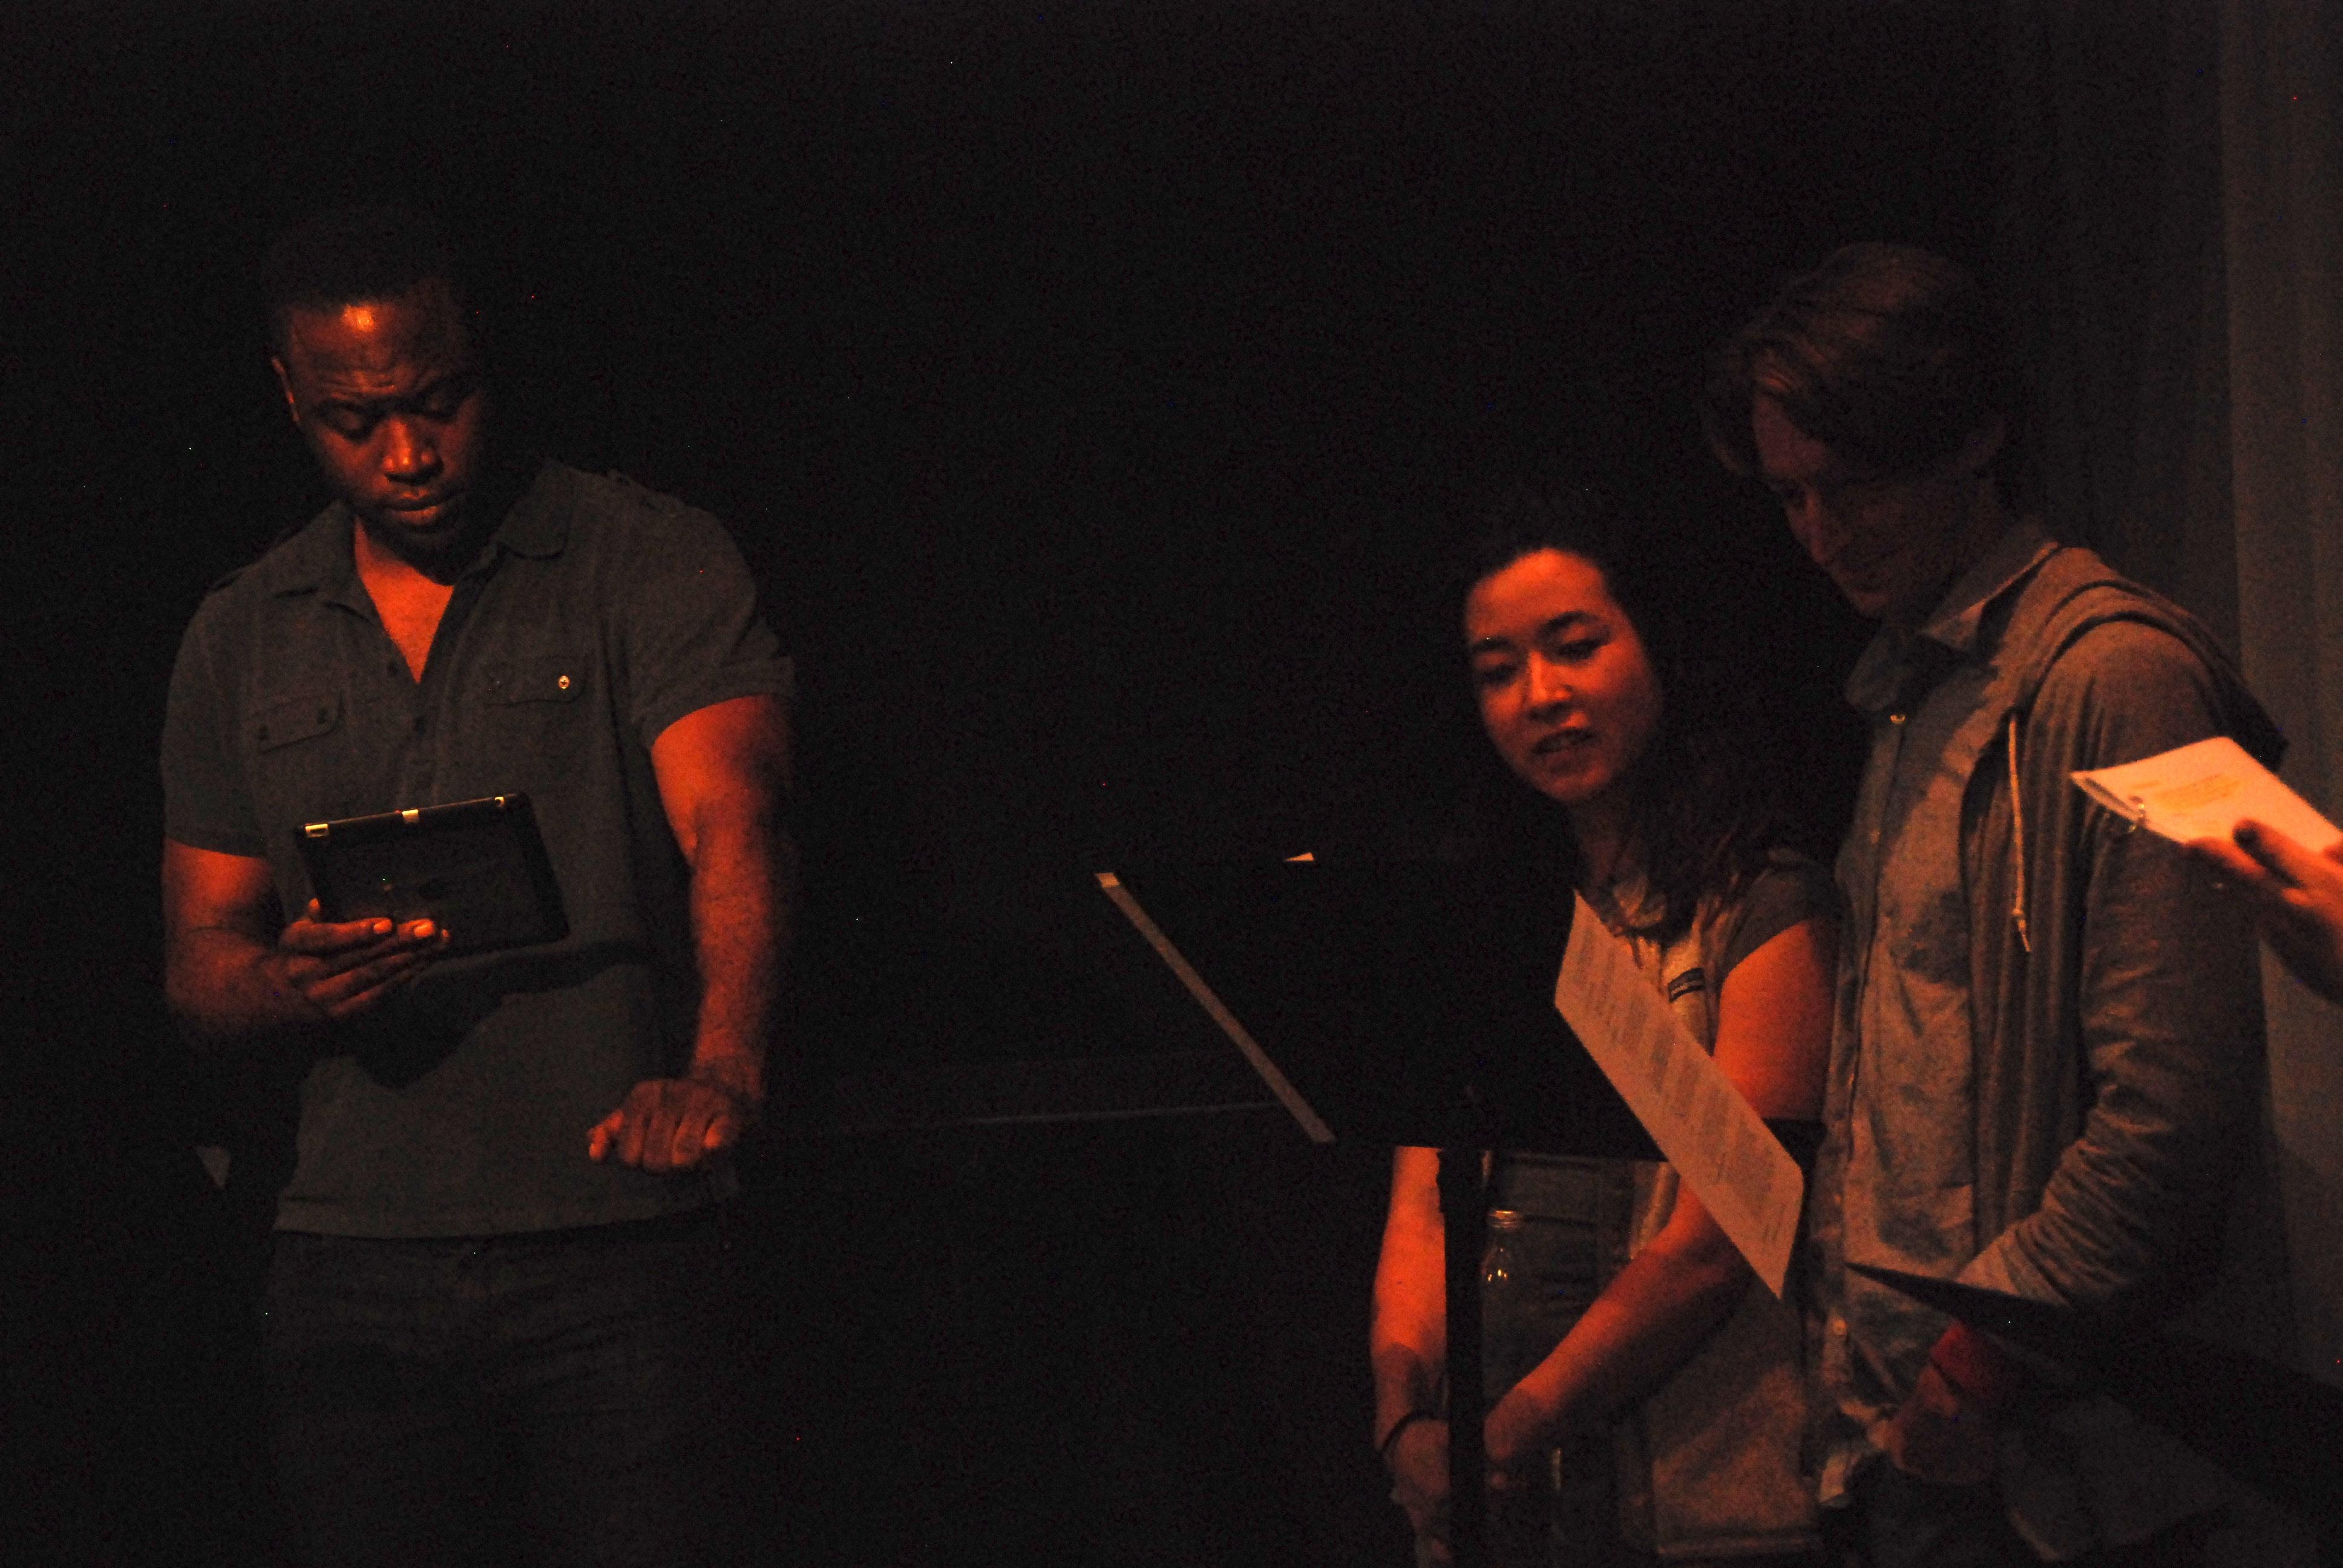 Theseus, Hermia, and Lysander